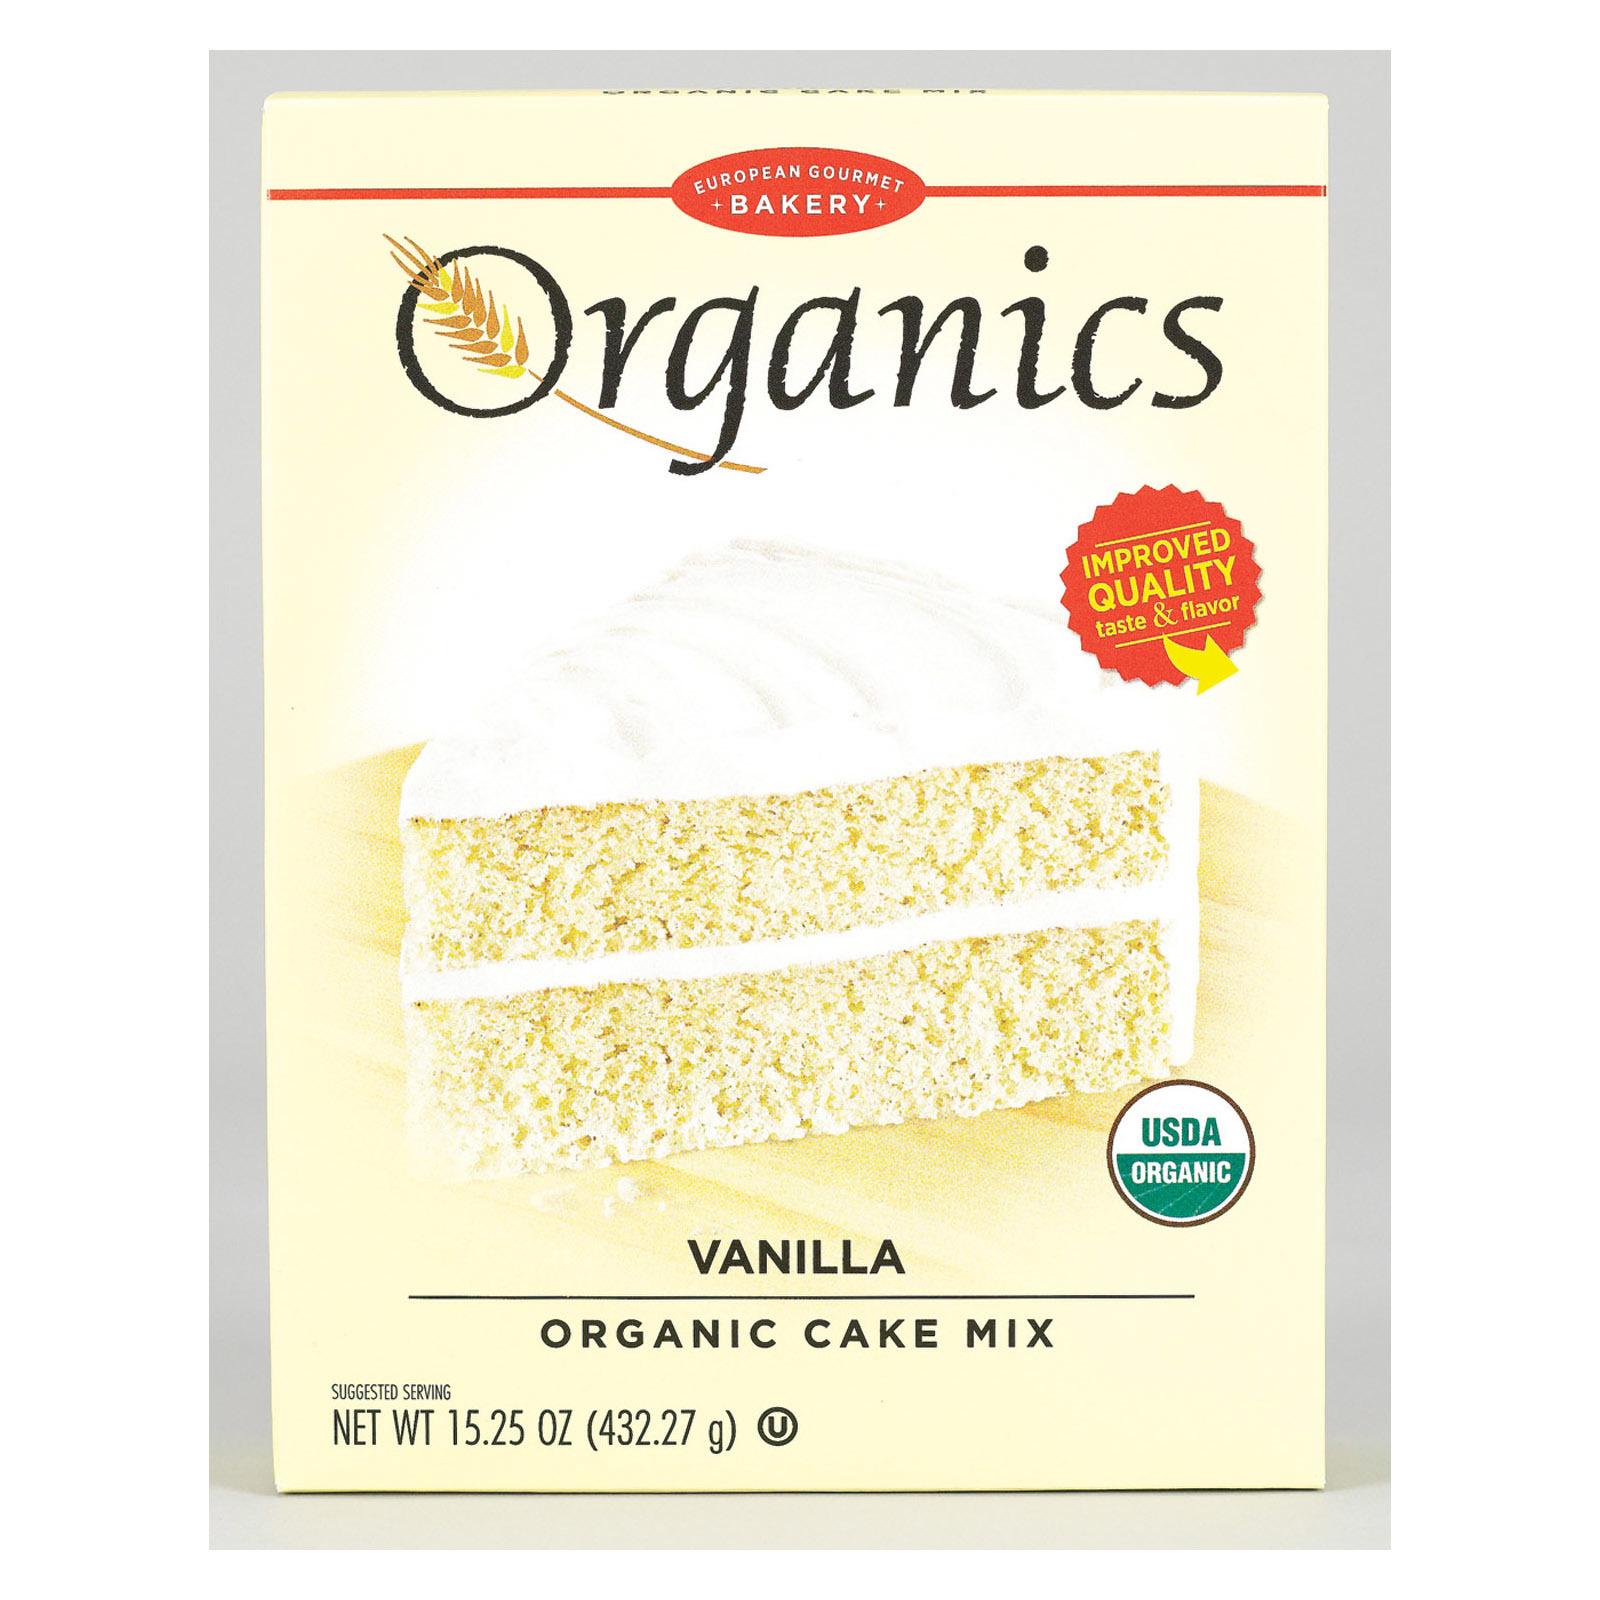 European Gourmet Bakery Organic Vanilla Cake Mix - Vanilla - 15.25 oz.